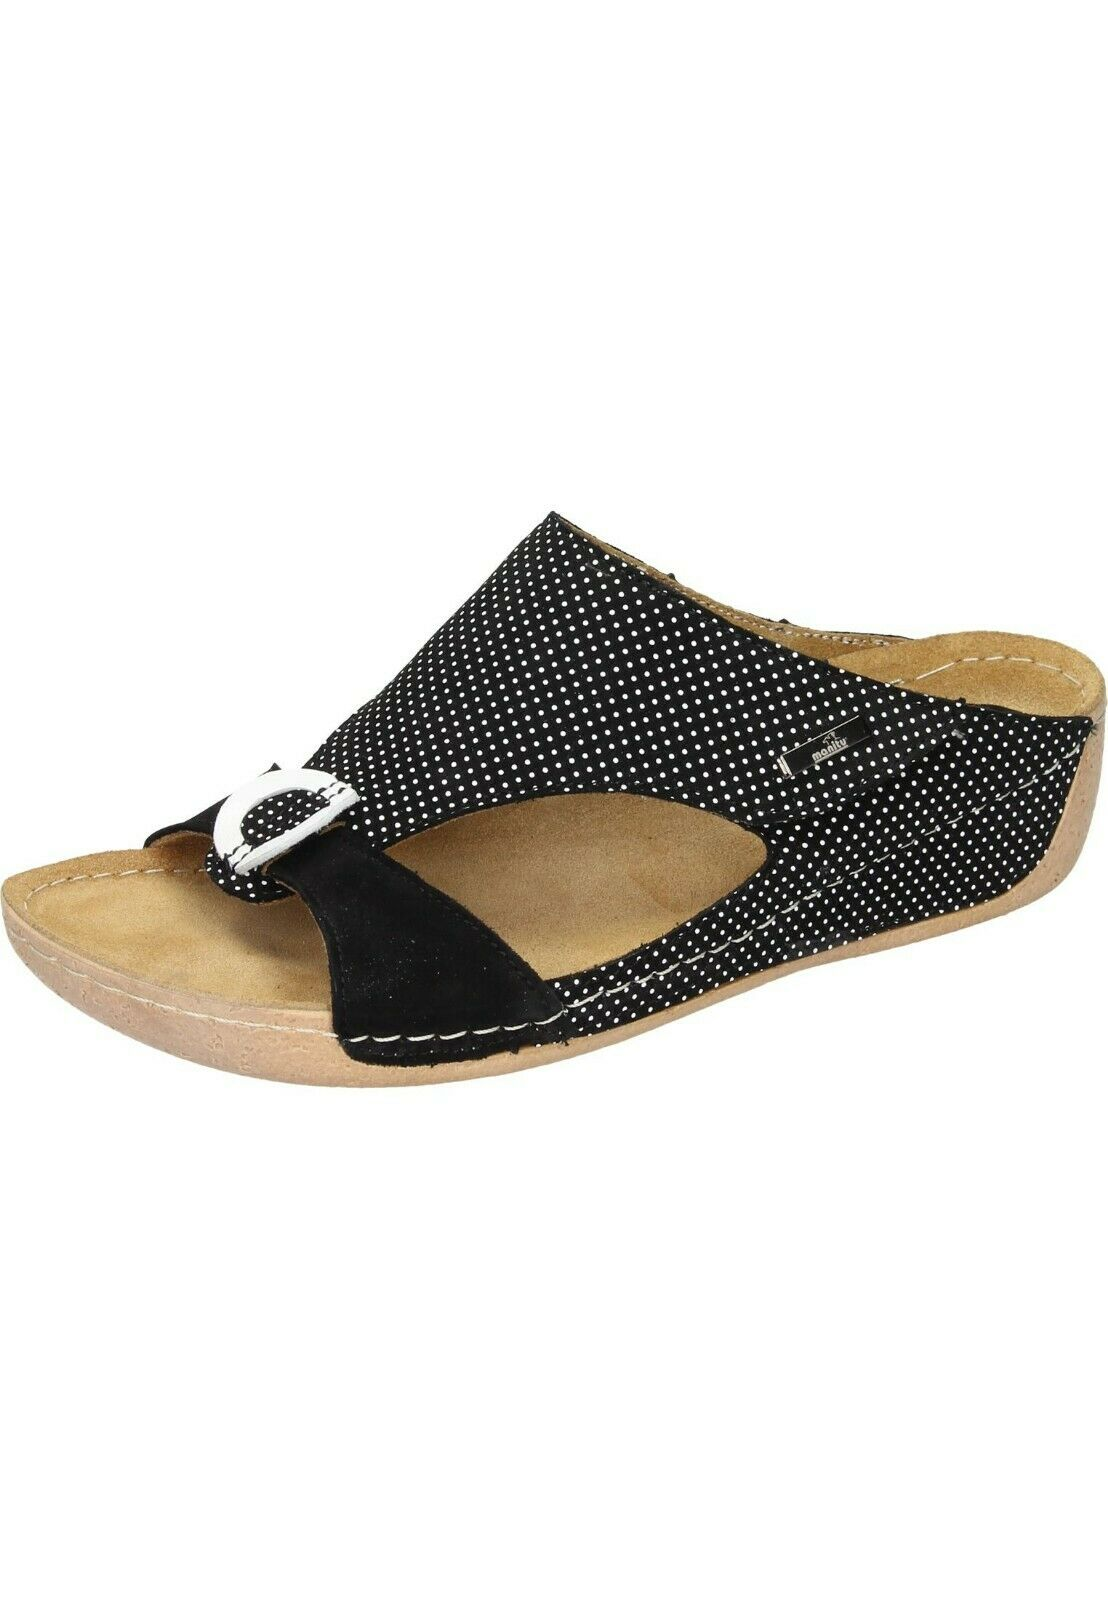 Arbeitsschuhe Pantolette Sandale Schlappen Klett SANITA Leder Weiß Gr 38 NEU